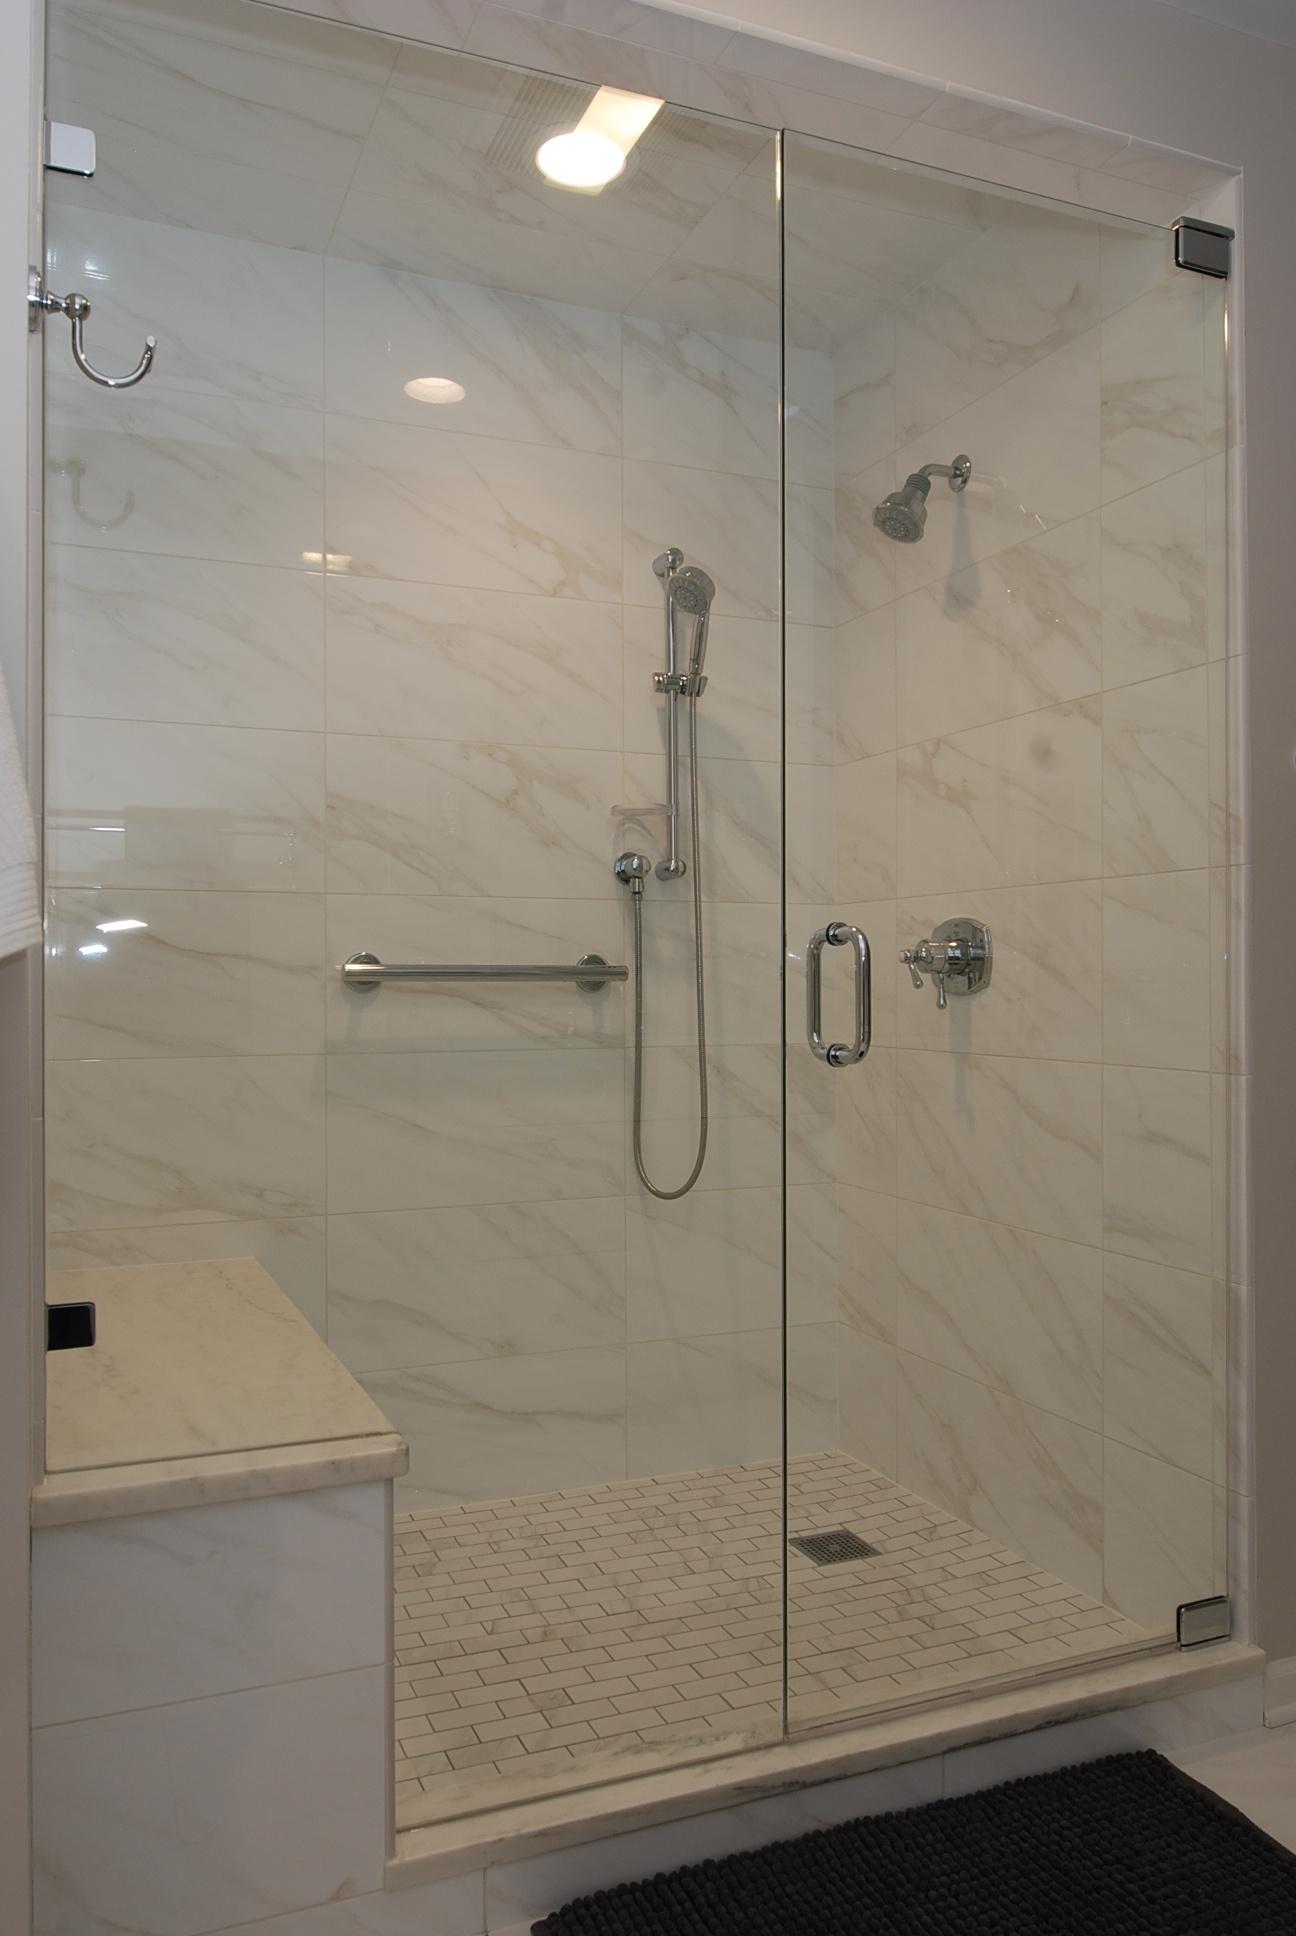 Designing Bathrooms With Universal Design Principles